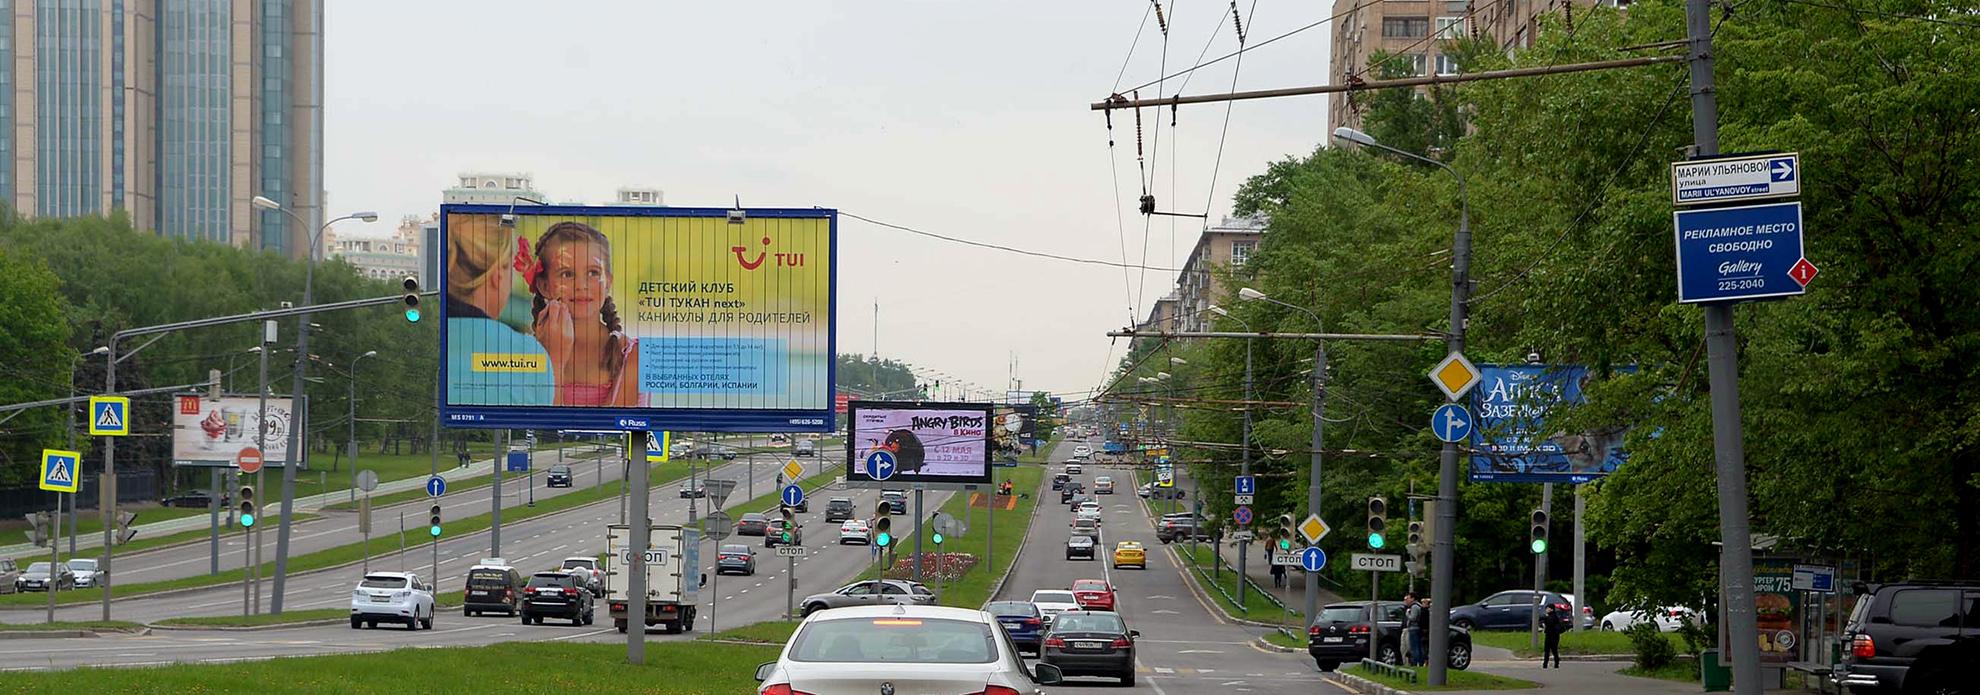 Billboard-3x6-naruzhnaya-reklama-Moskow